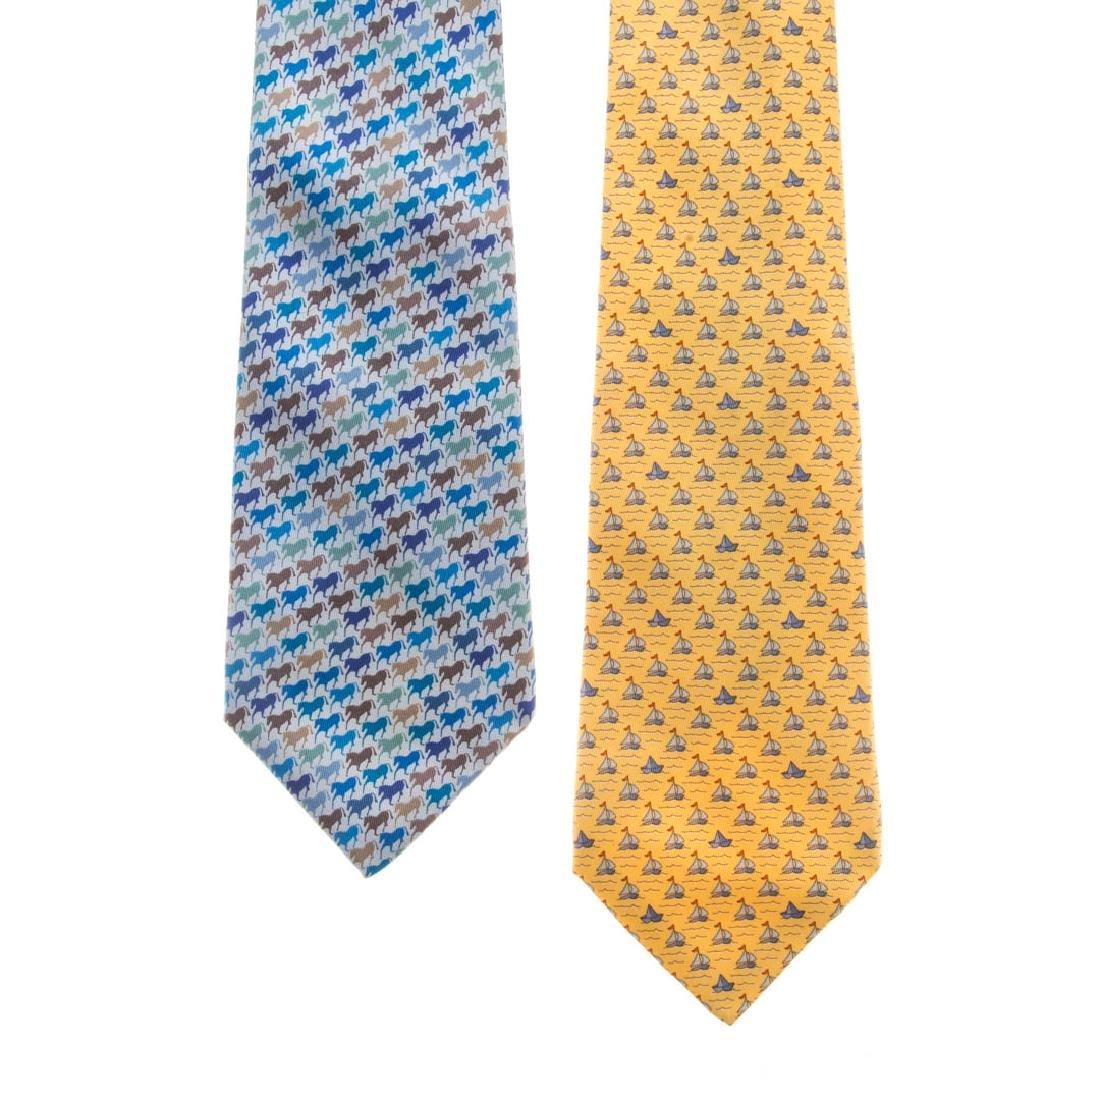 Hermès Horse Print Tie & Sailboat Print Tie